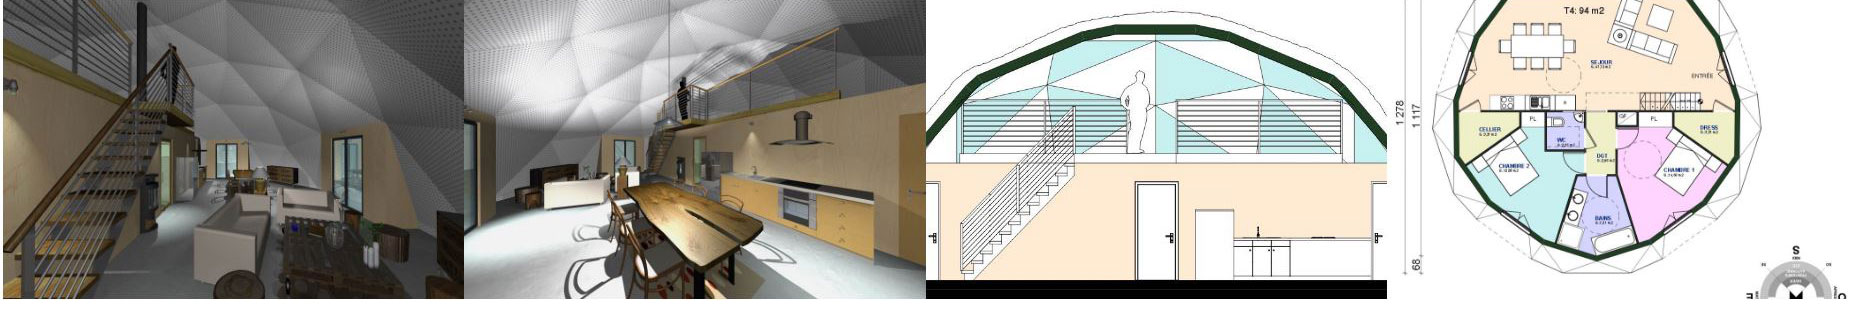 etude architecturale